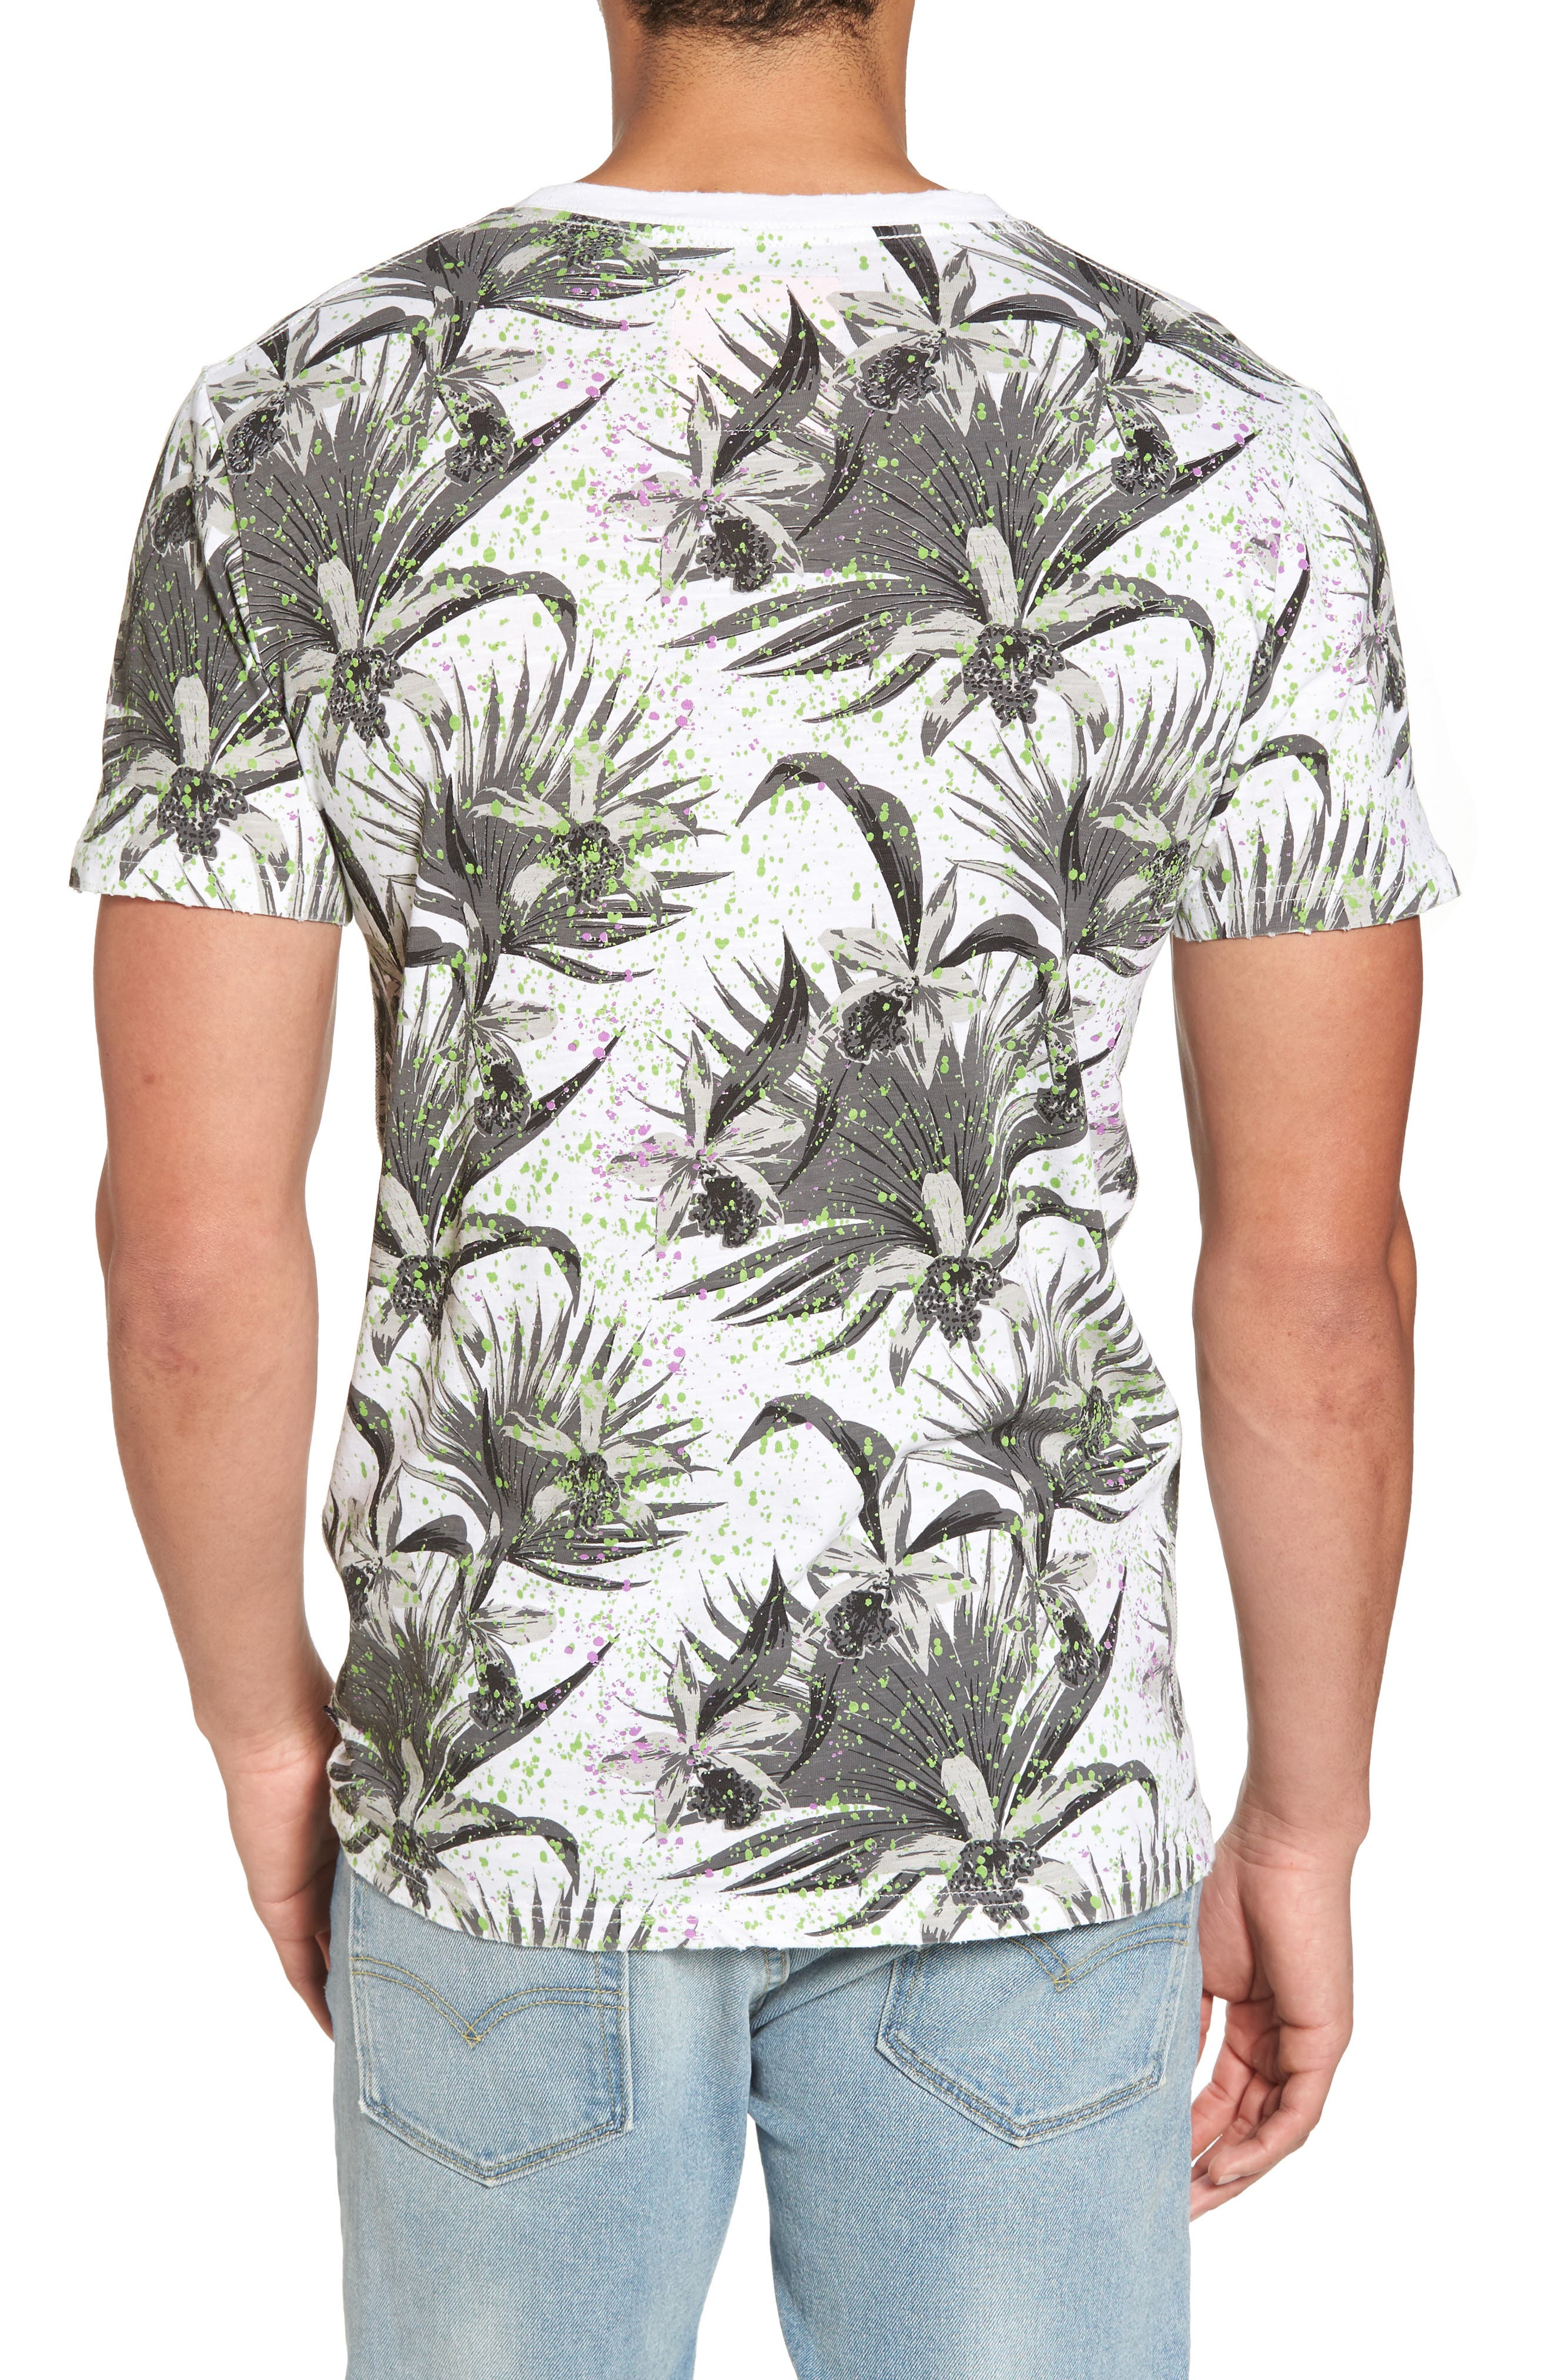 Shirt Shop Aop T-Shirt,                             Alternate thumbnail 2, color,                             Optic